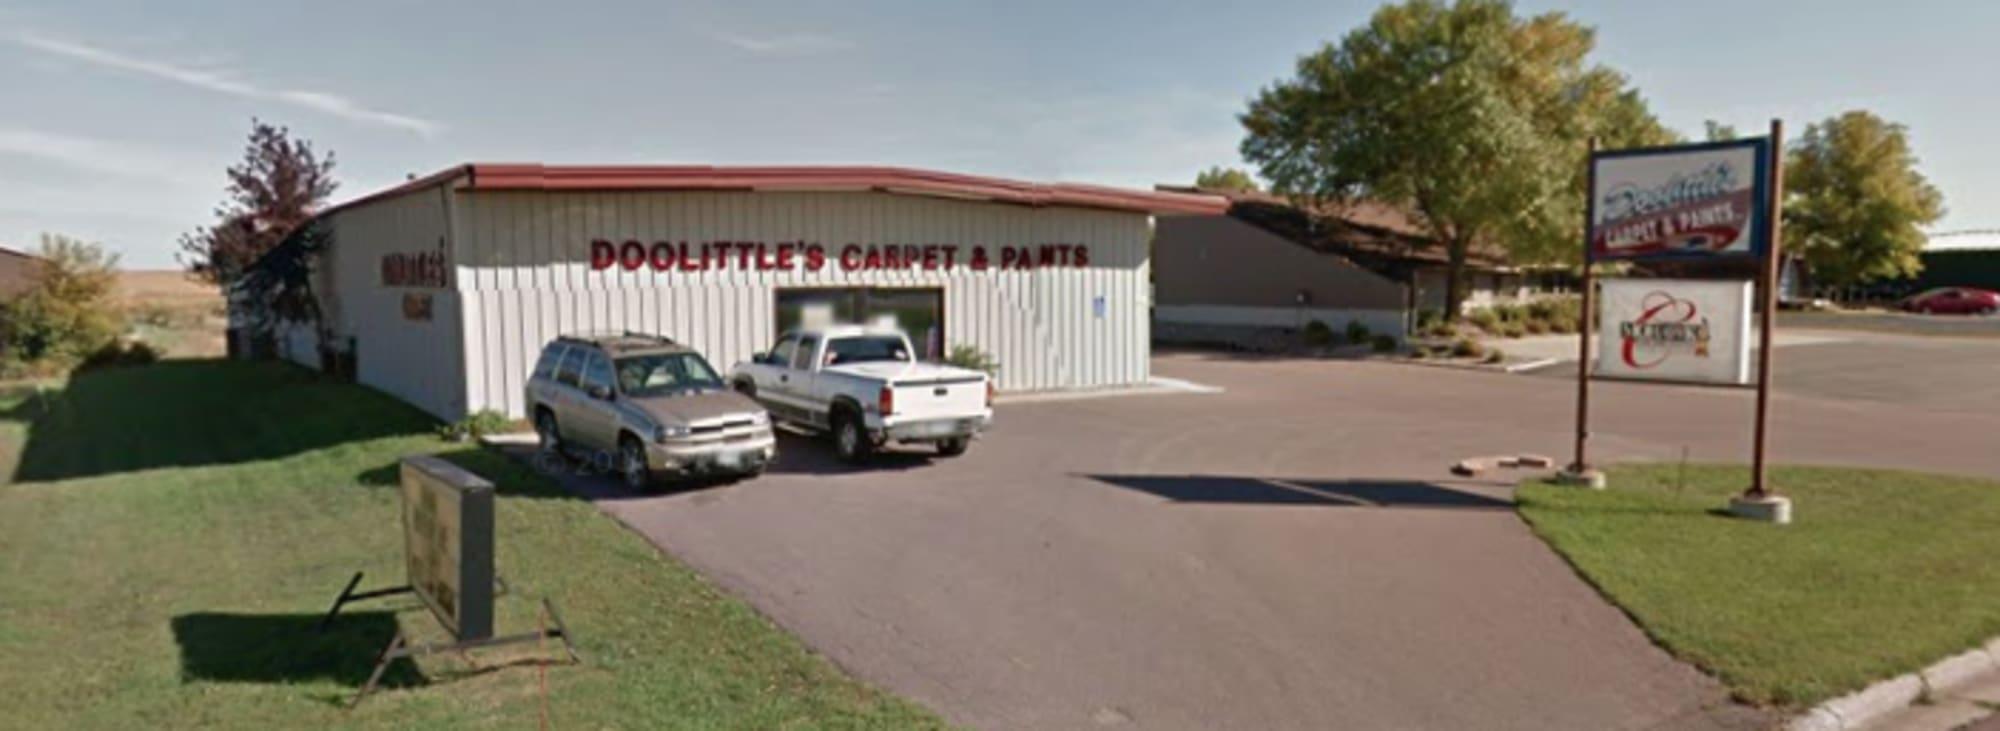 Doolittle's Carpet & Paints - 1225 MN-15 Fairmont, MN 56031